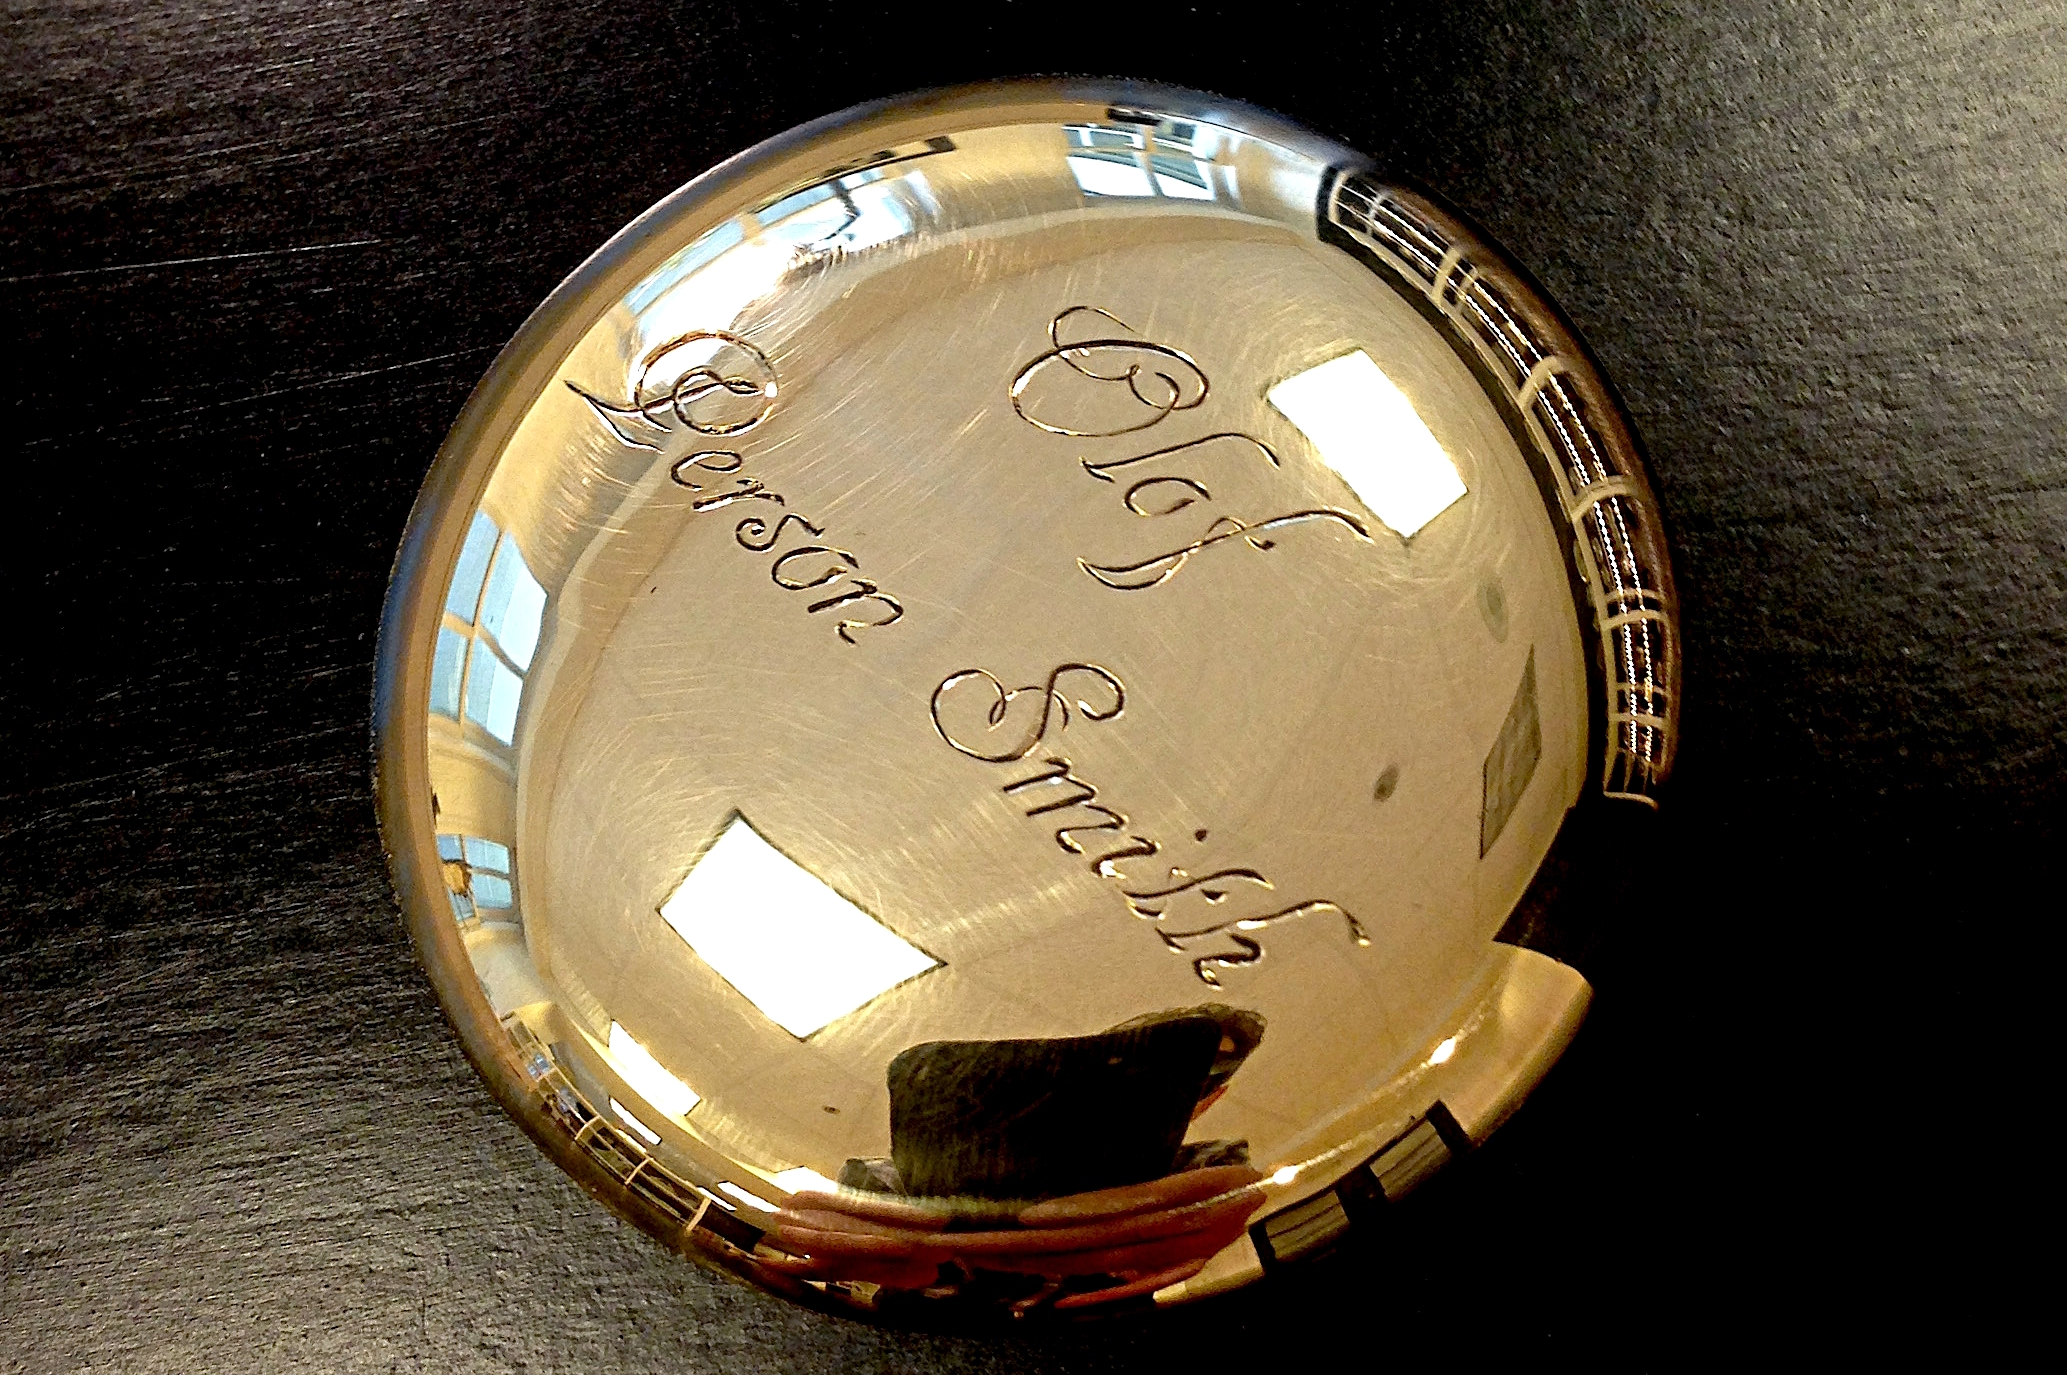 hodinky zlate rucni psani.JPG